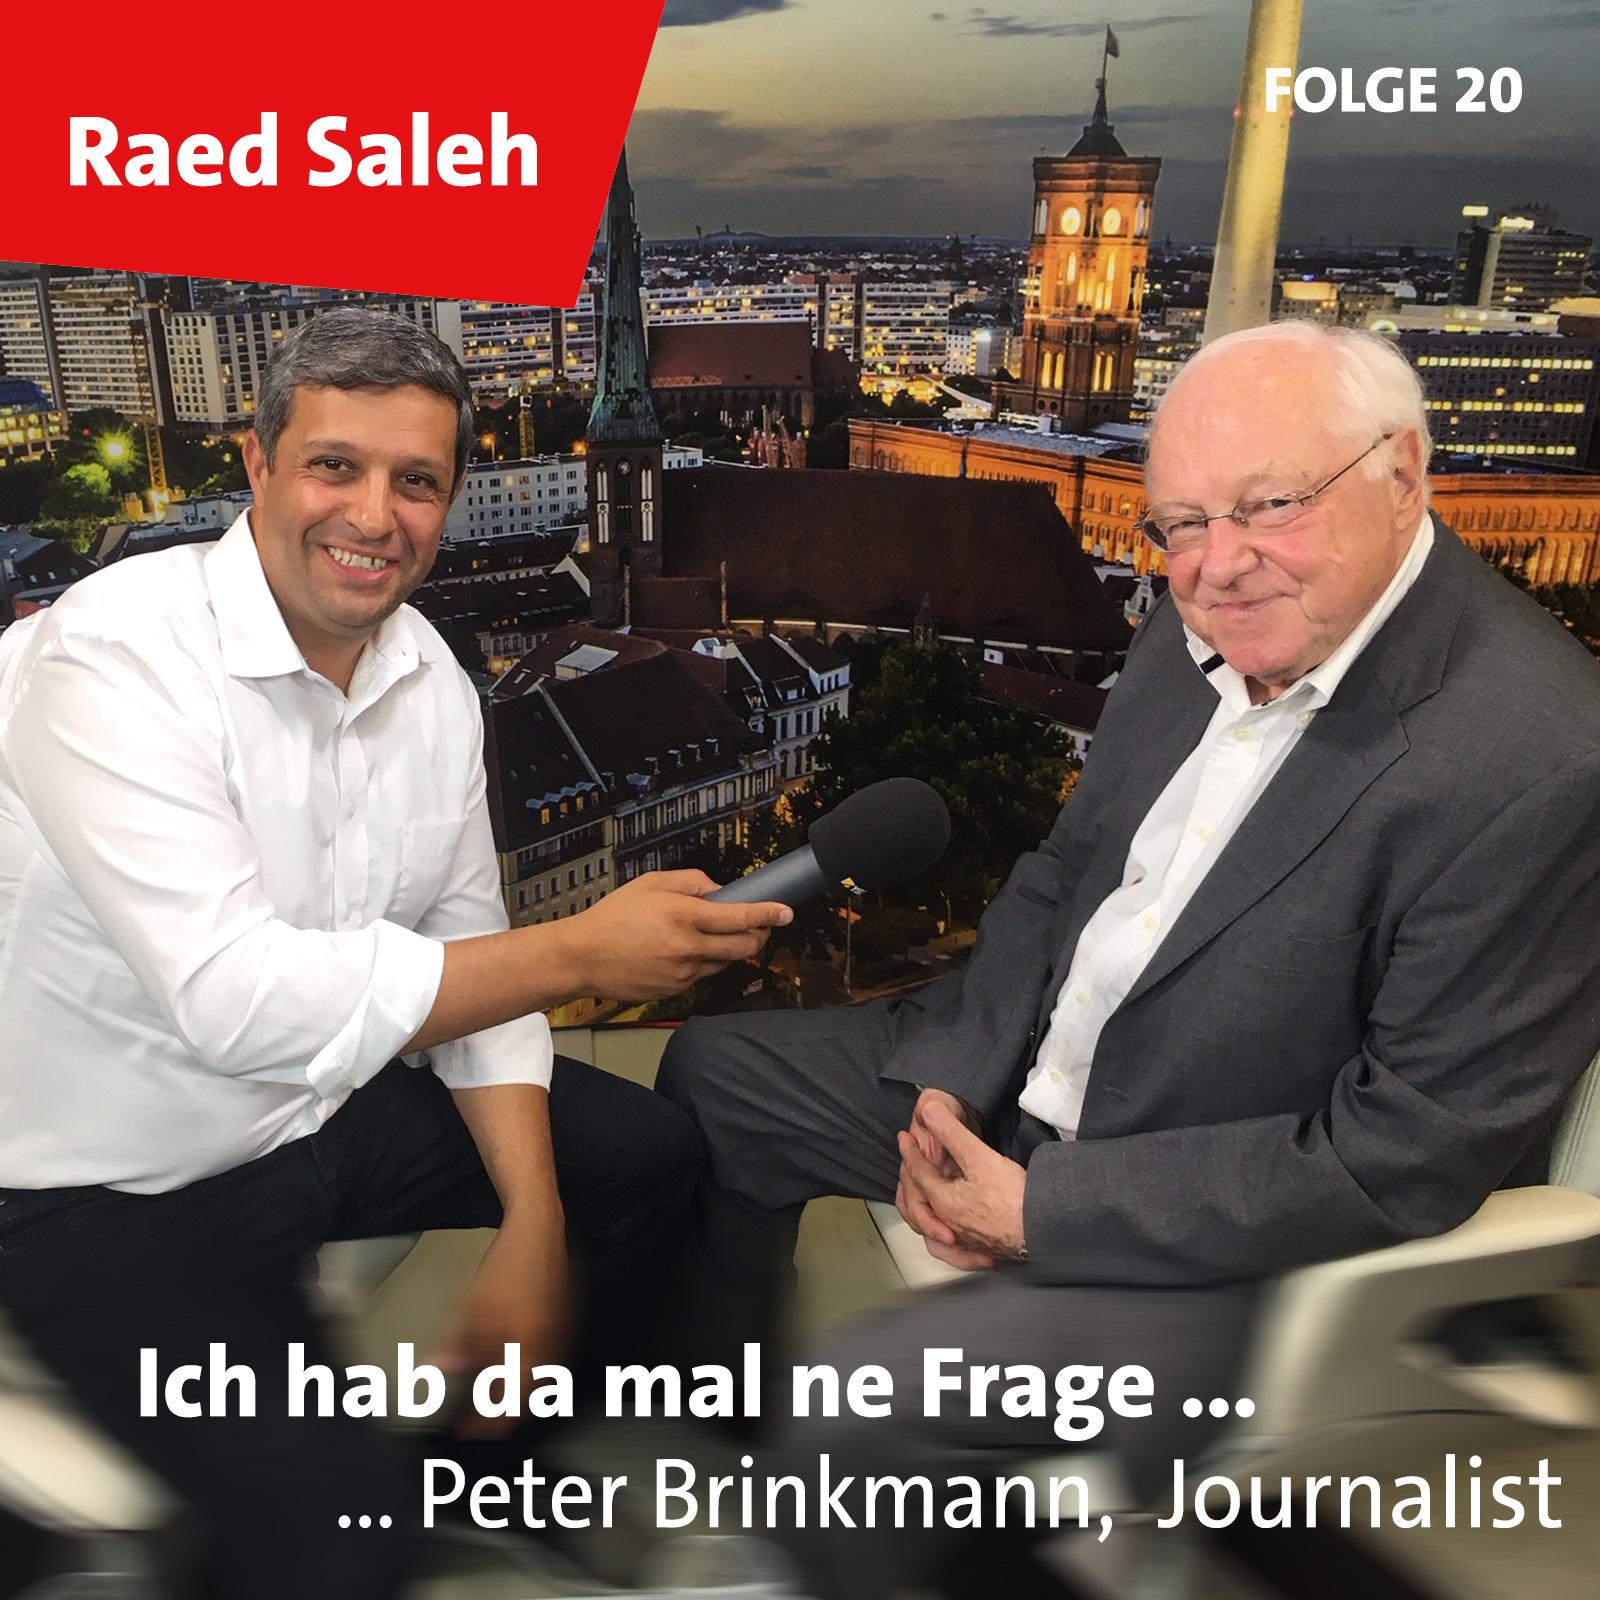 Folge 20: Peter Brinkmann, Journalist